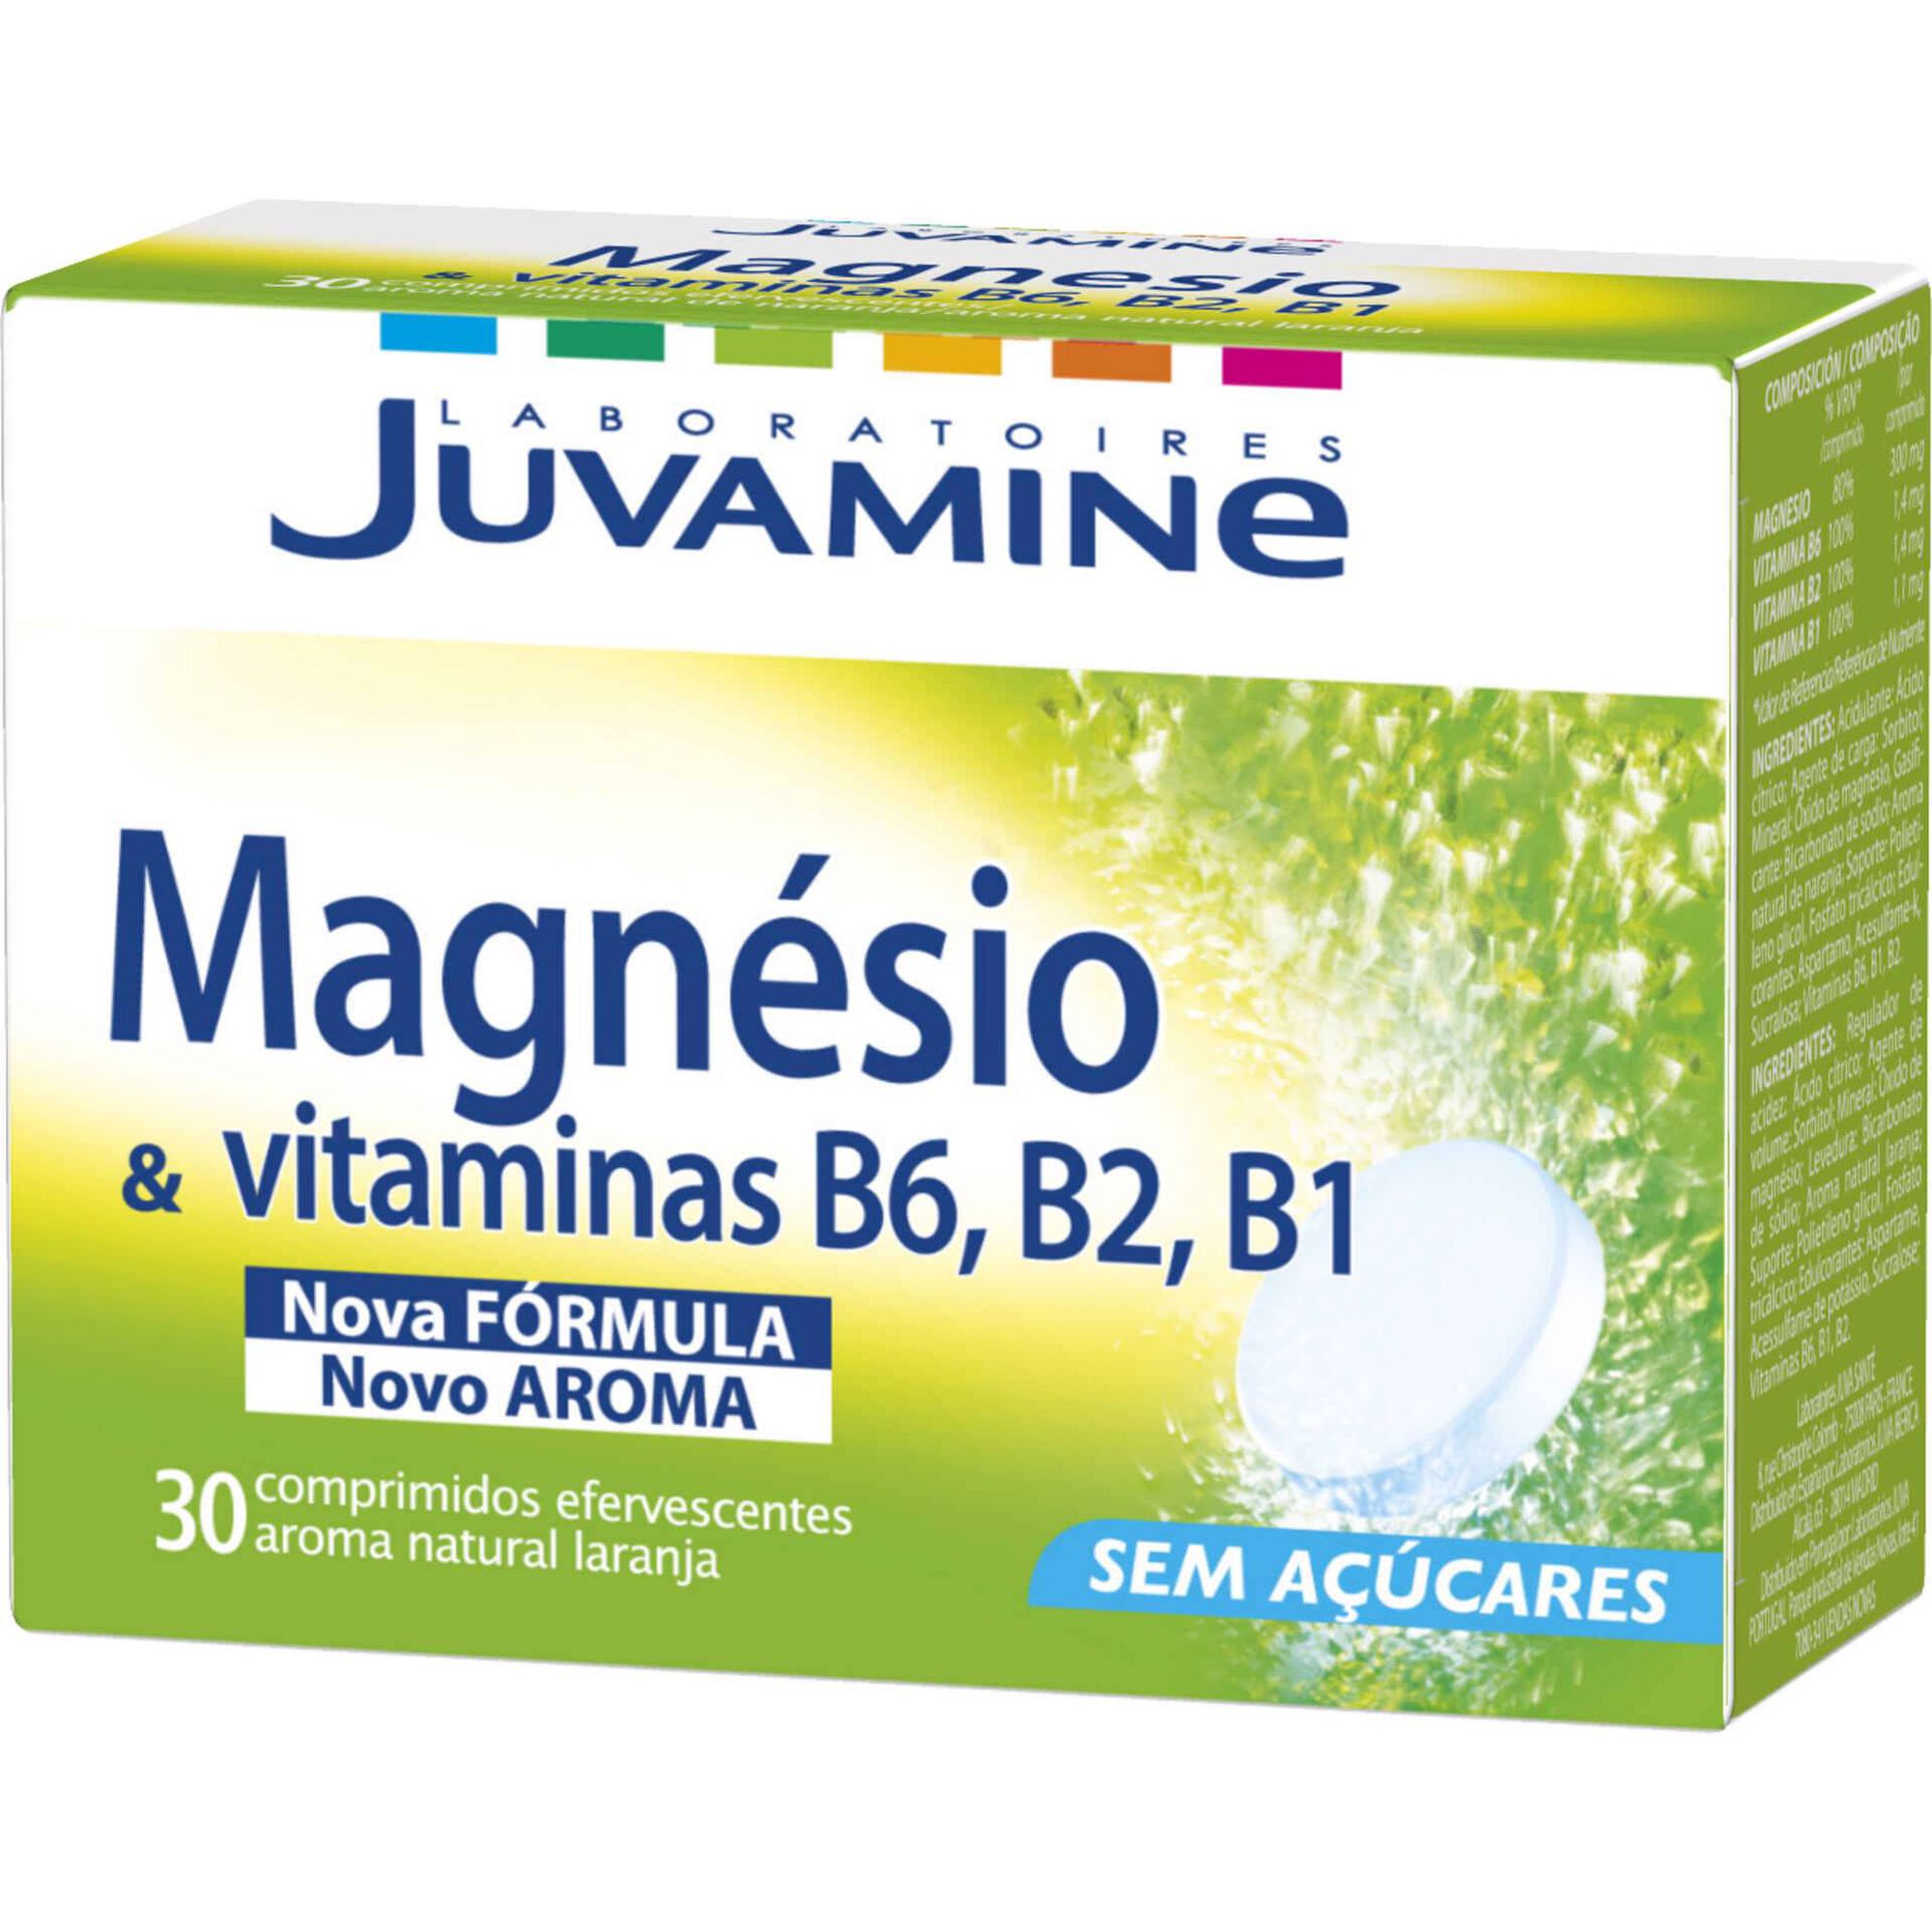 Suplemento Alimentar Magnésio e Vitaminas B6,B2,B1